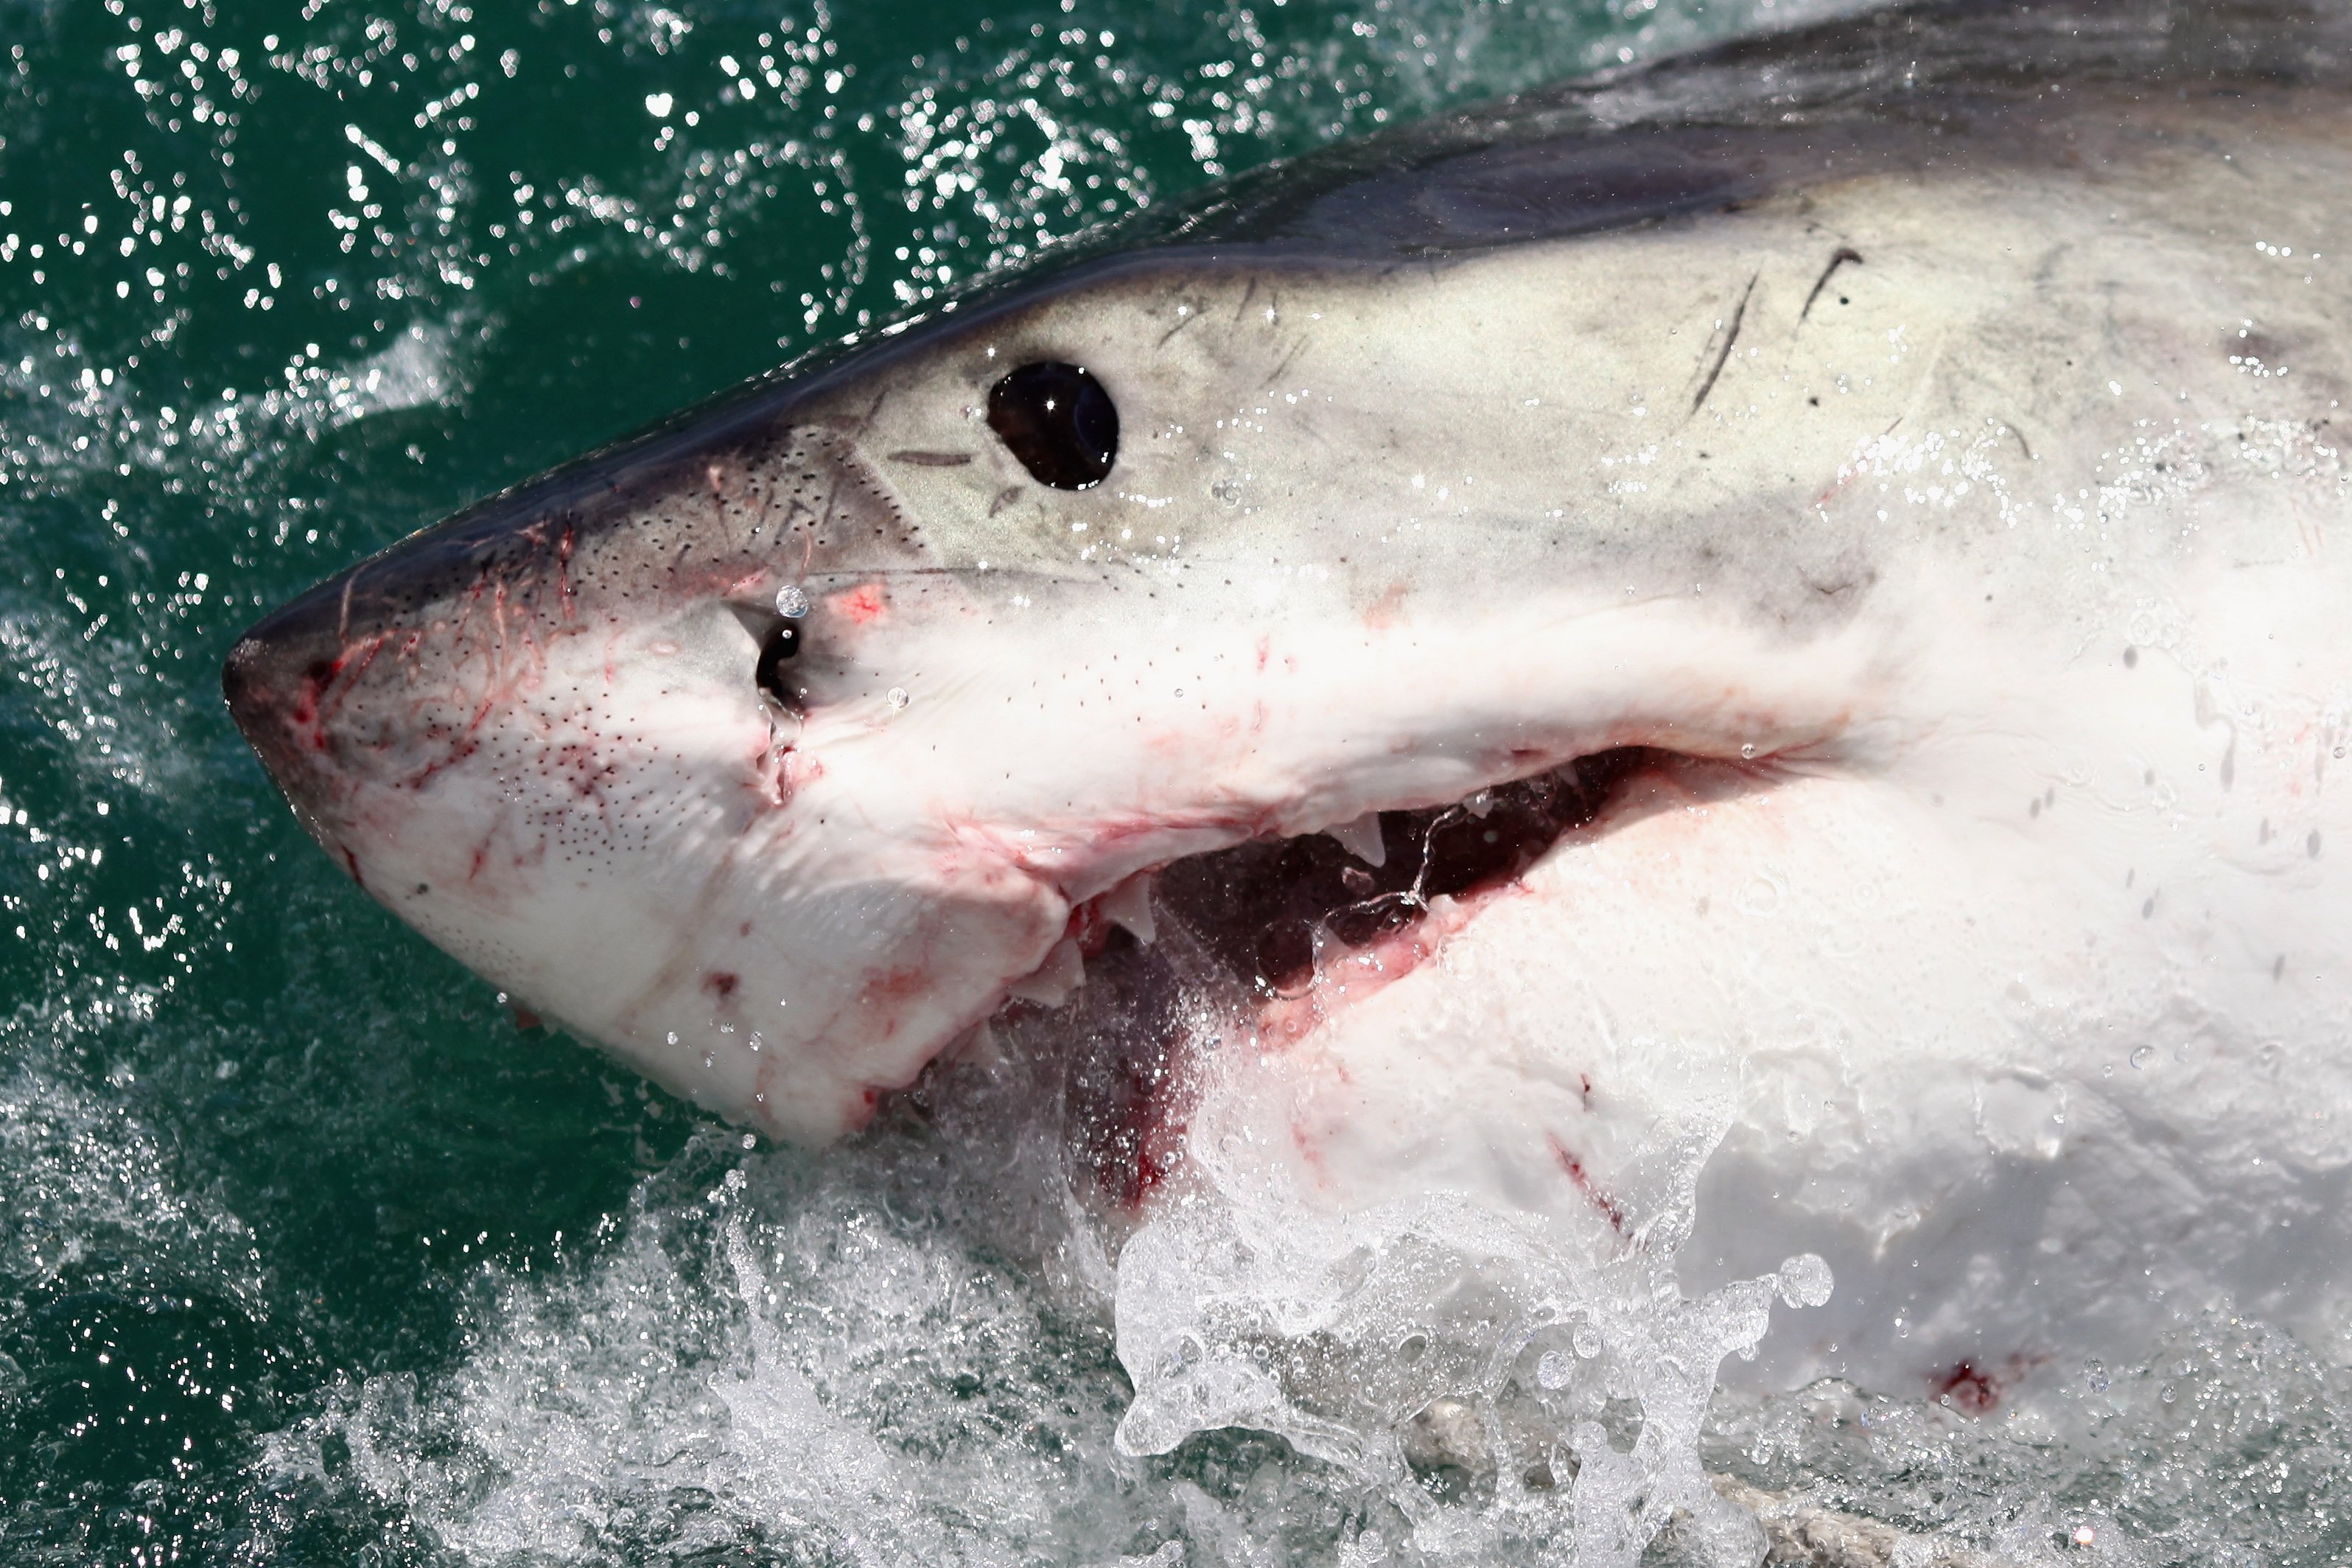 Shark Bites Kayak Leaving Teeth Behind in Terrifying Attack Off California